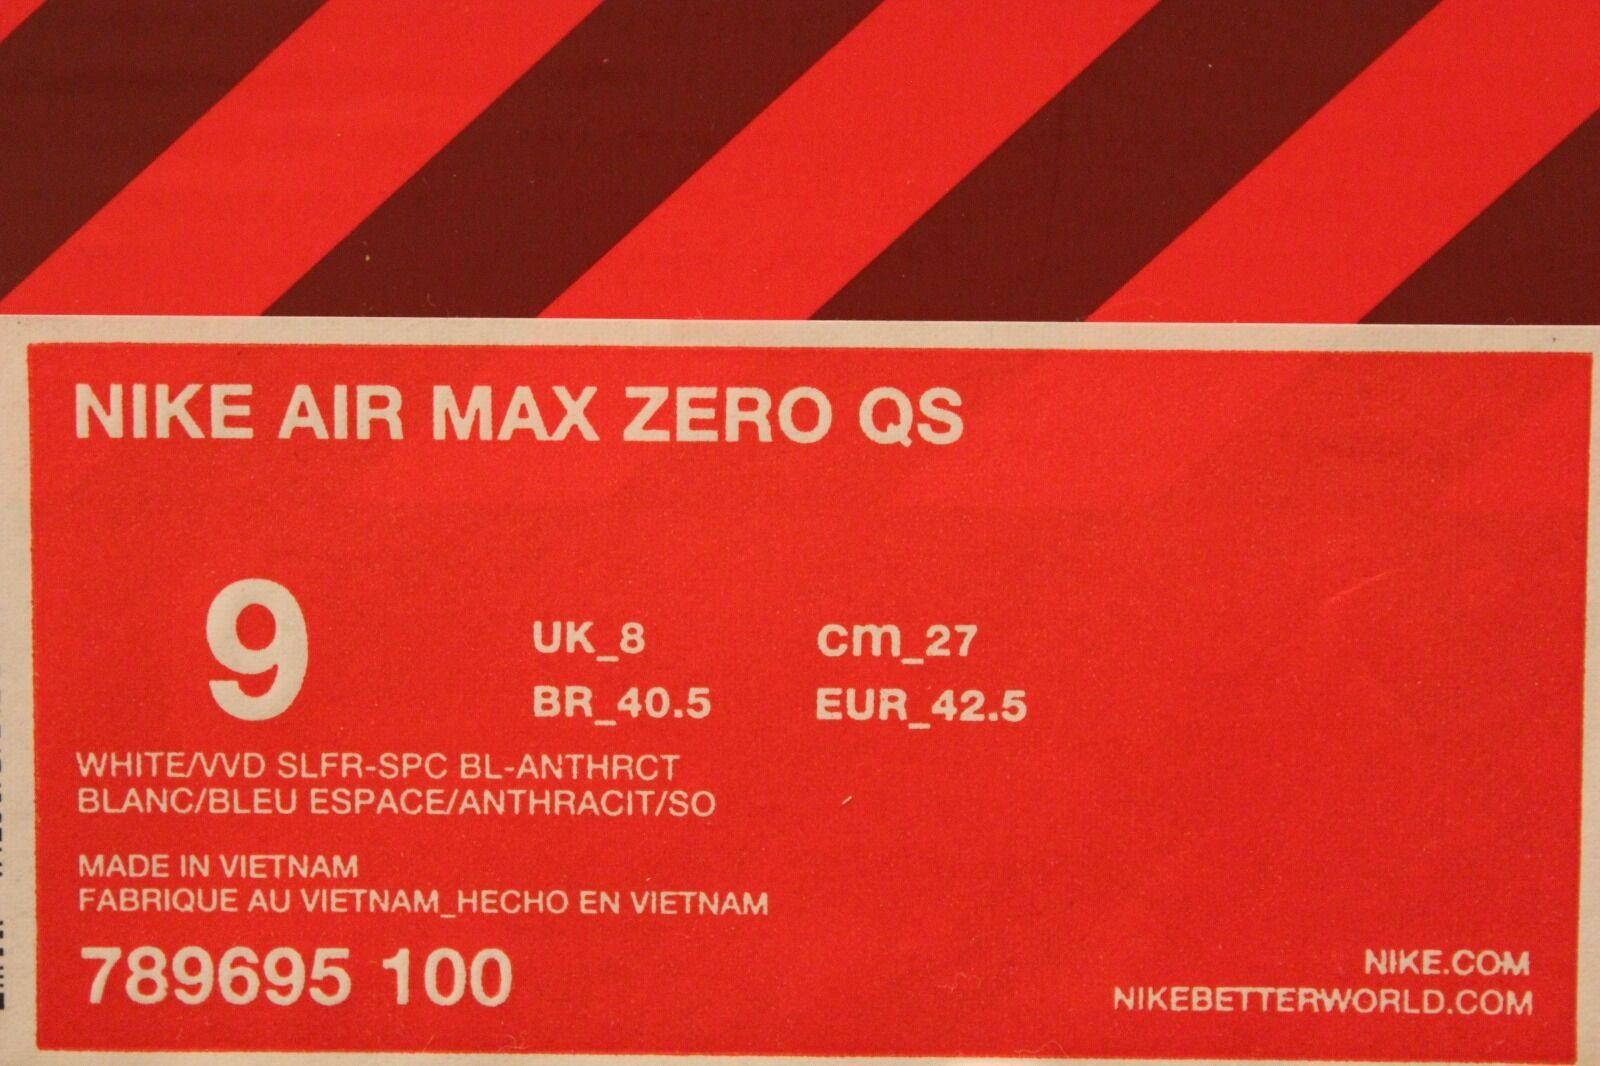 neue männer nike air max null - männer neue uns größe 9 laufschuhe d04311